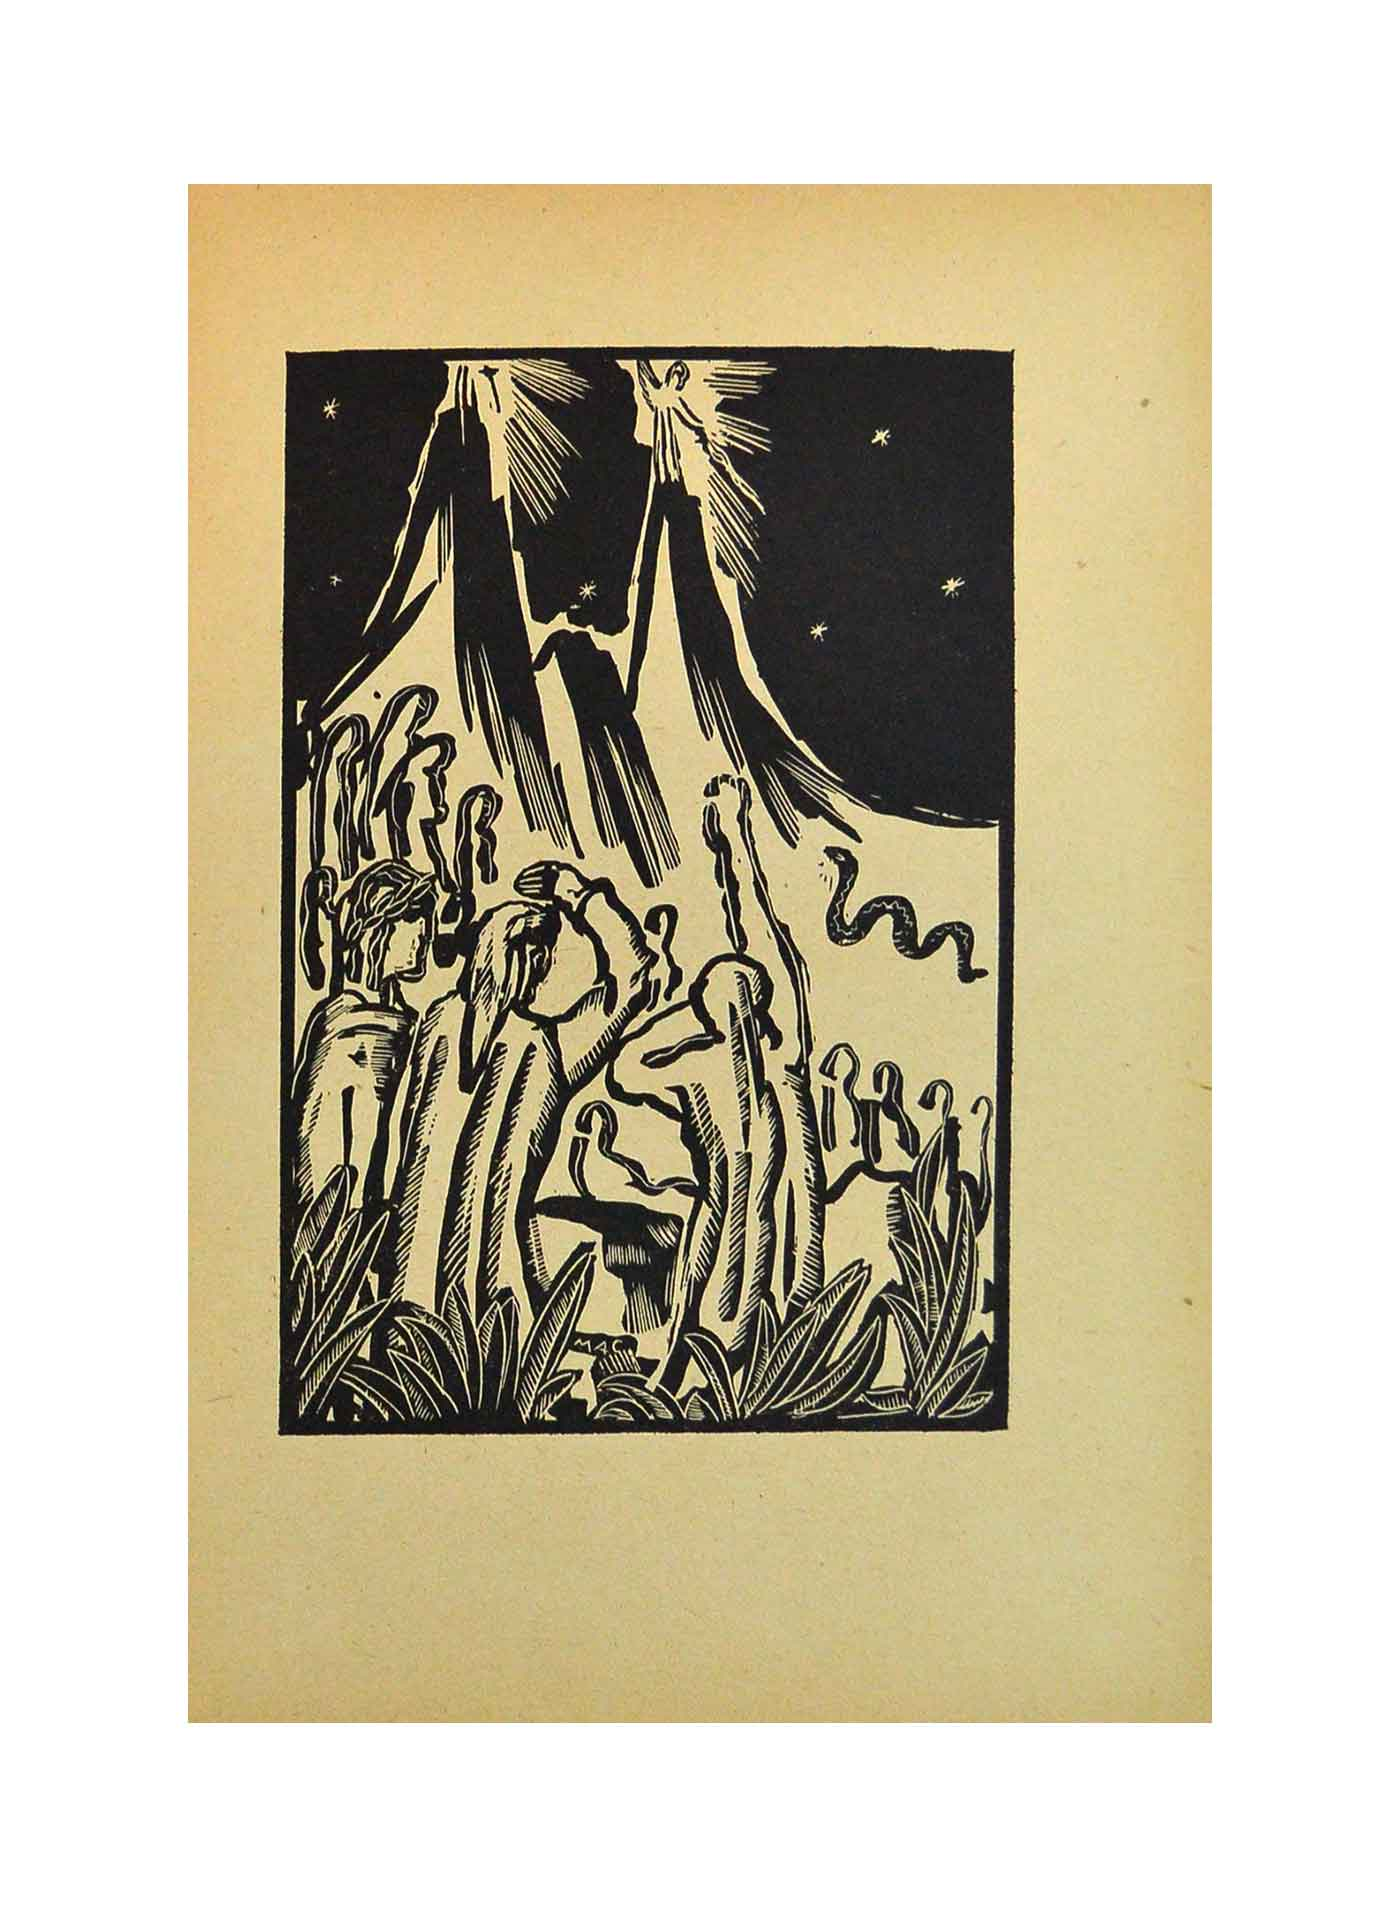 Dante Purgatoriul 1937